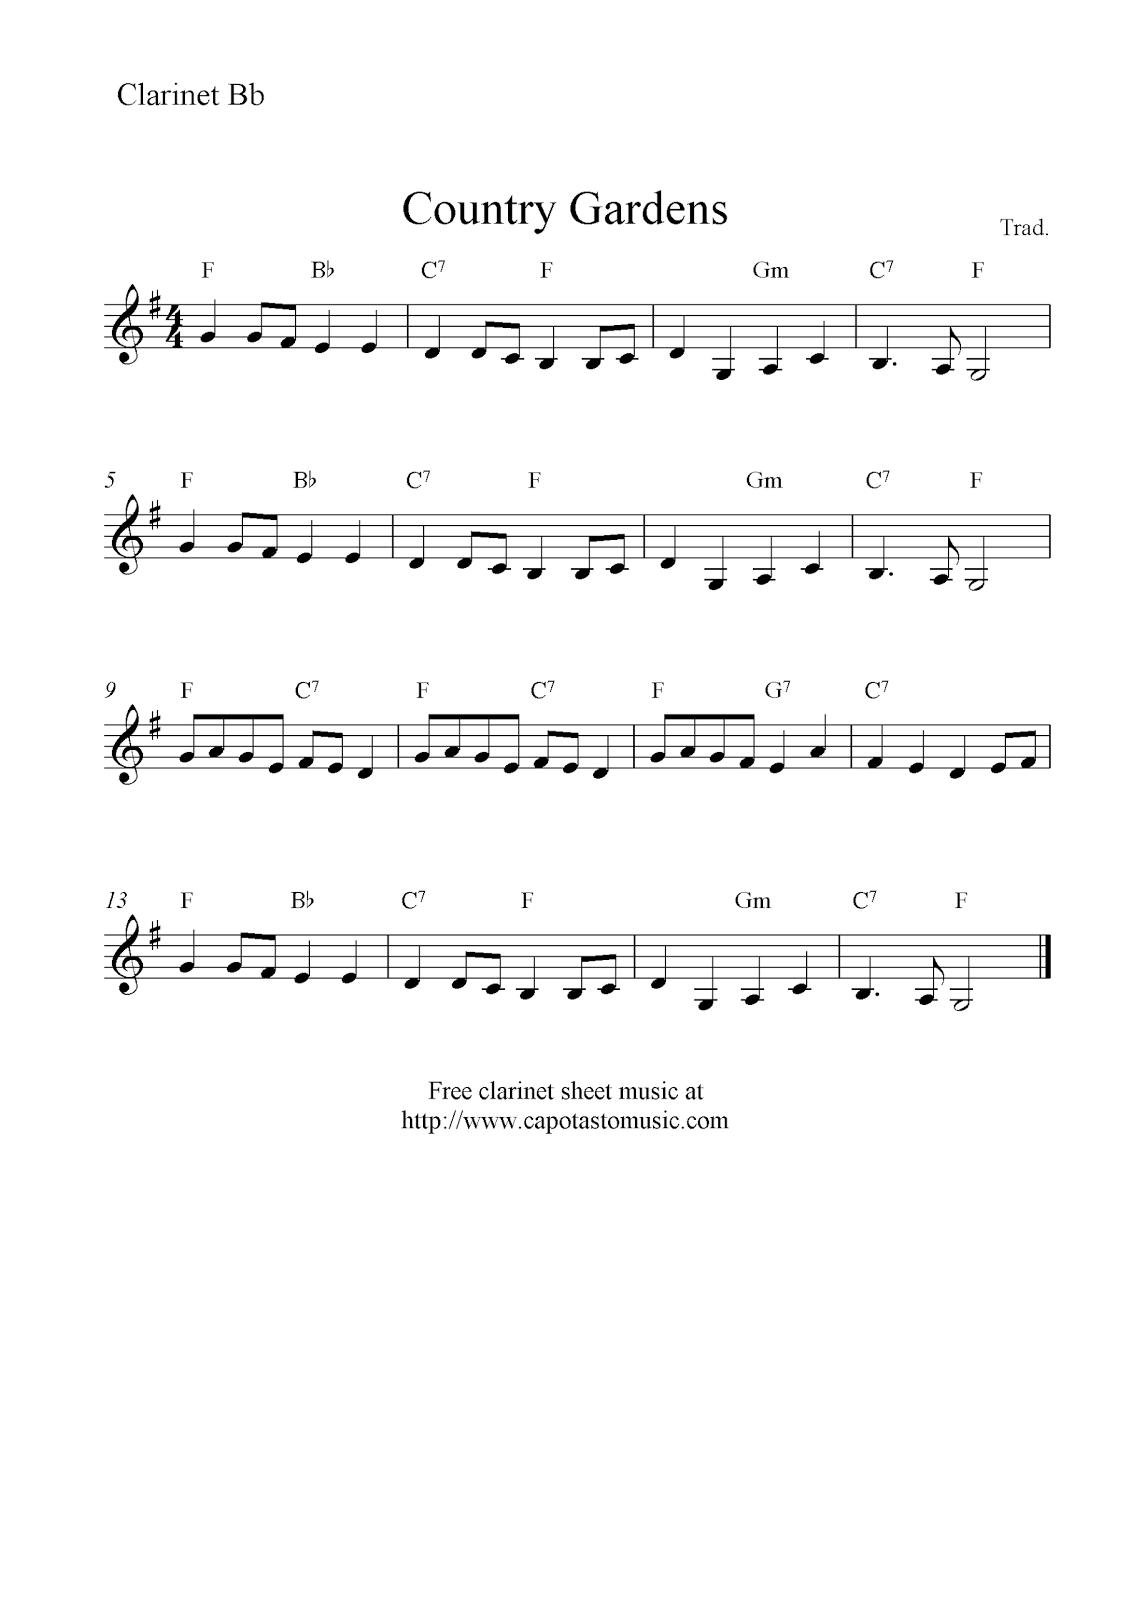 Astounding image inside free printable clarinet sheet music